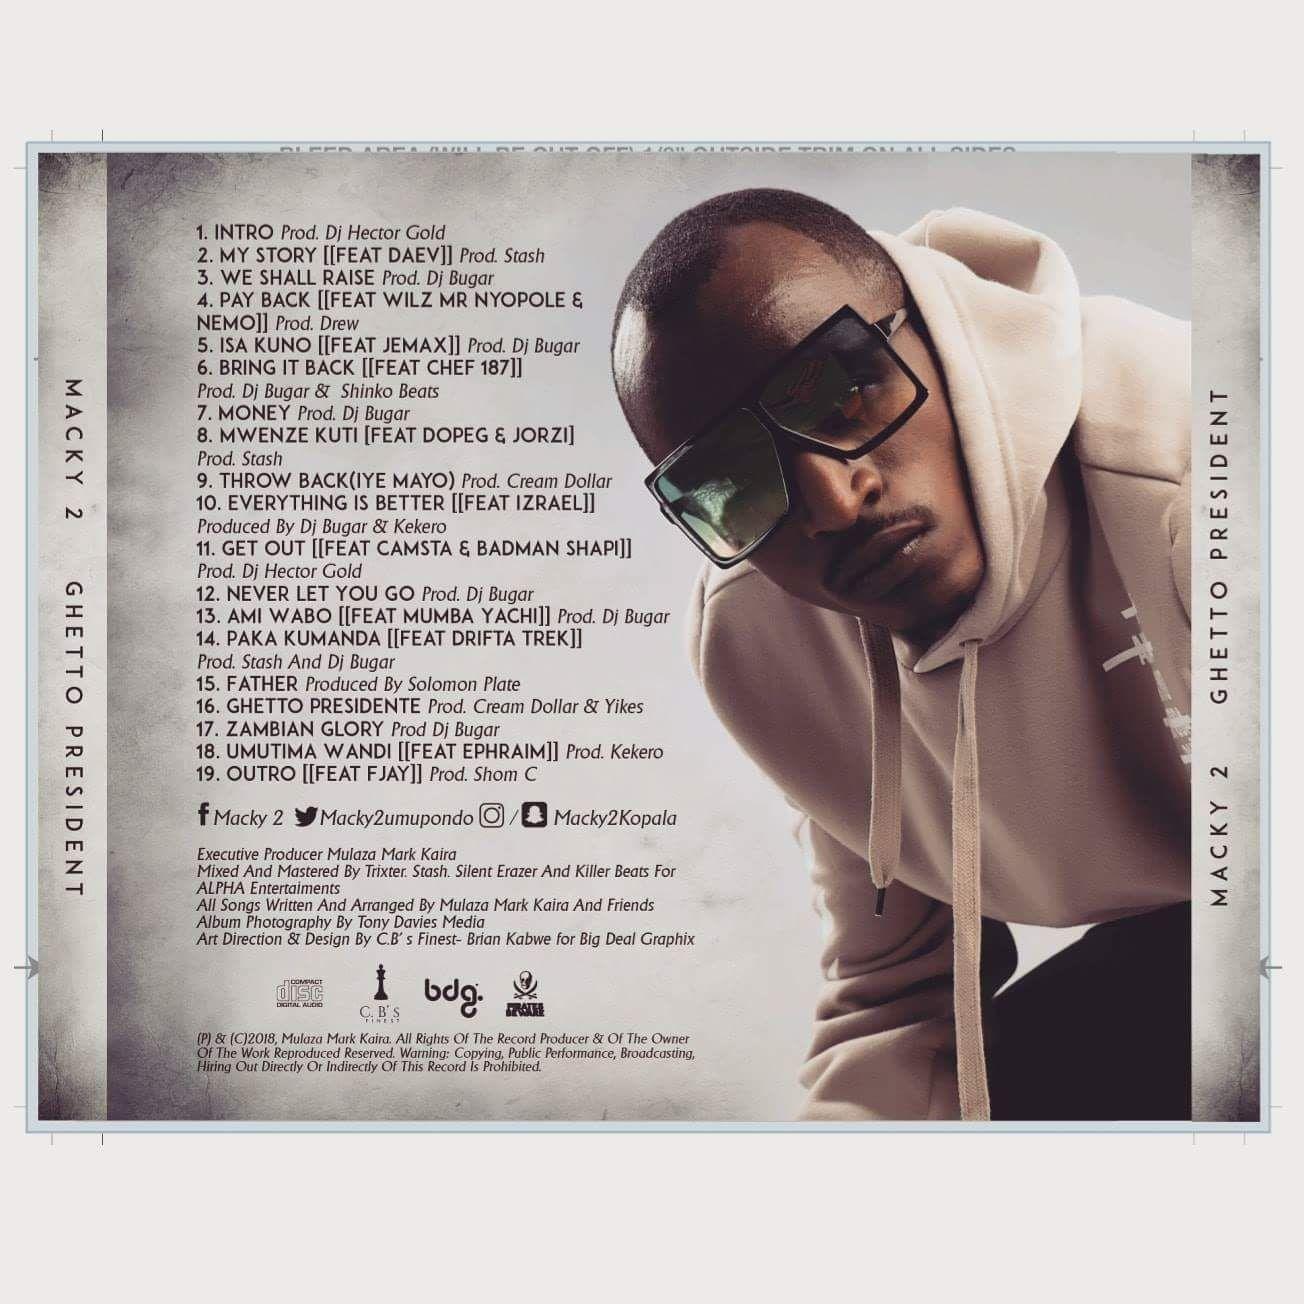 Download Album Macky 2 Ghetto President Zip Music Download Nigeria Africa 3gp Movies